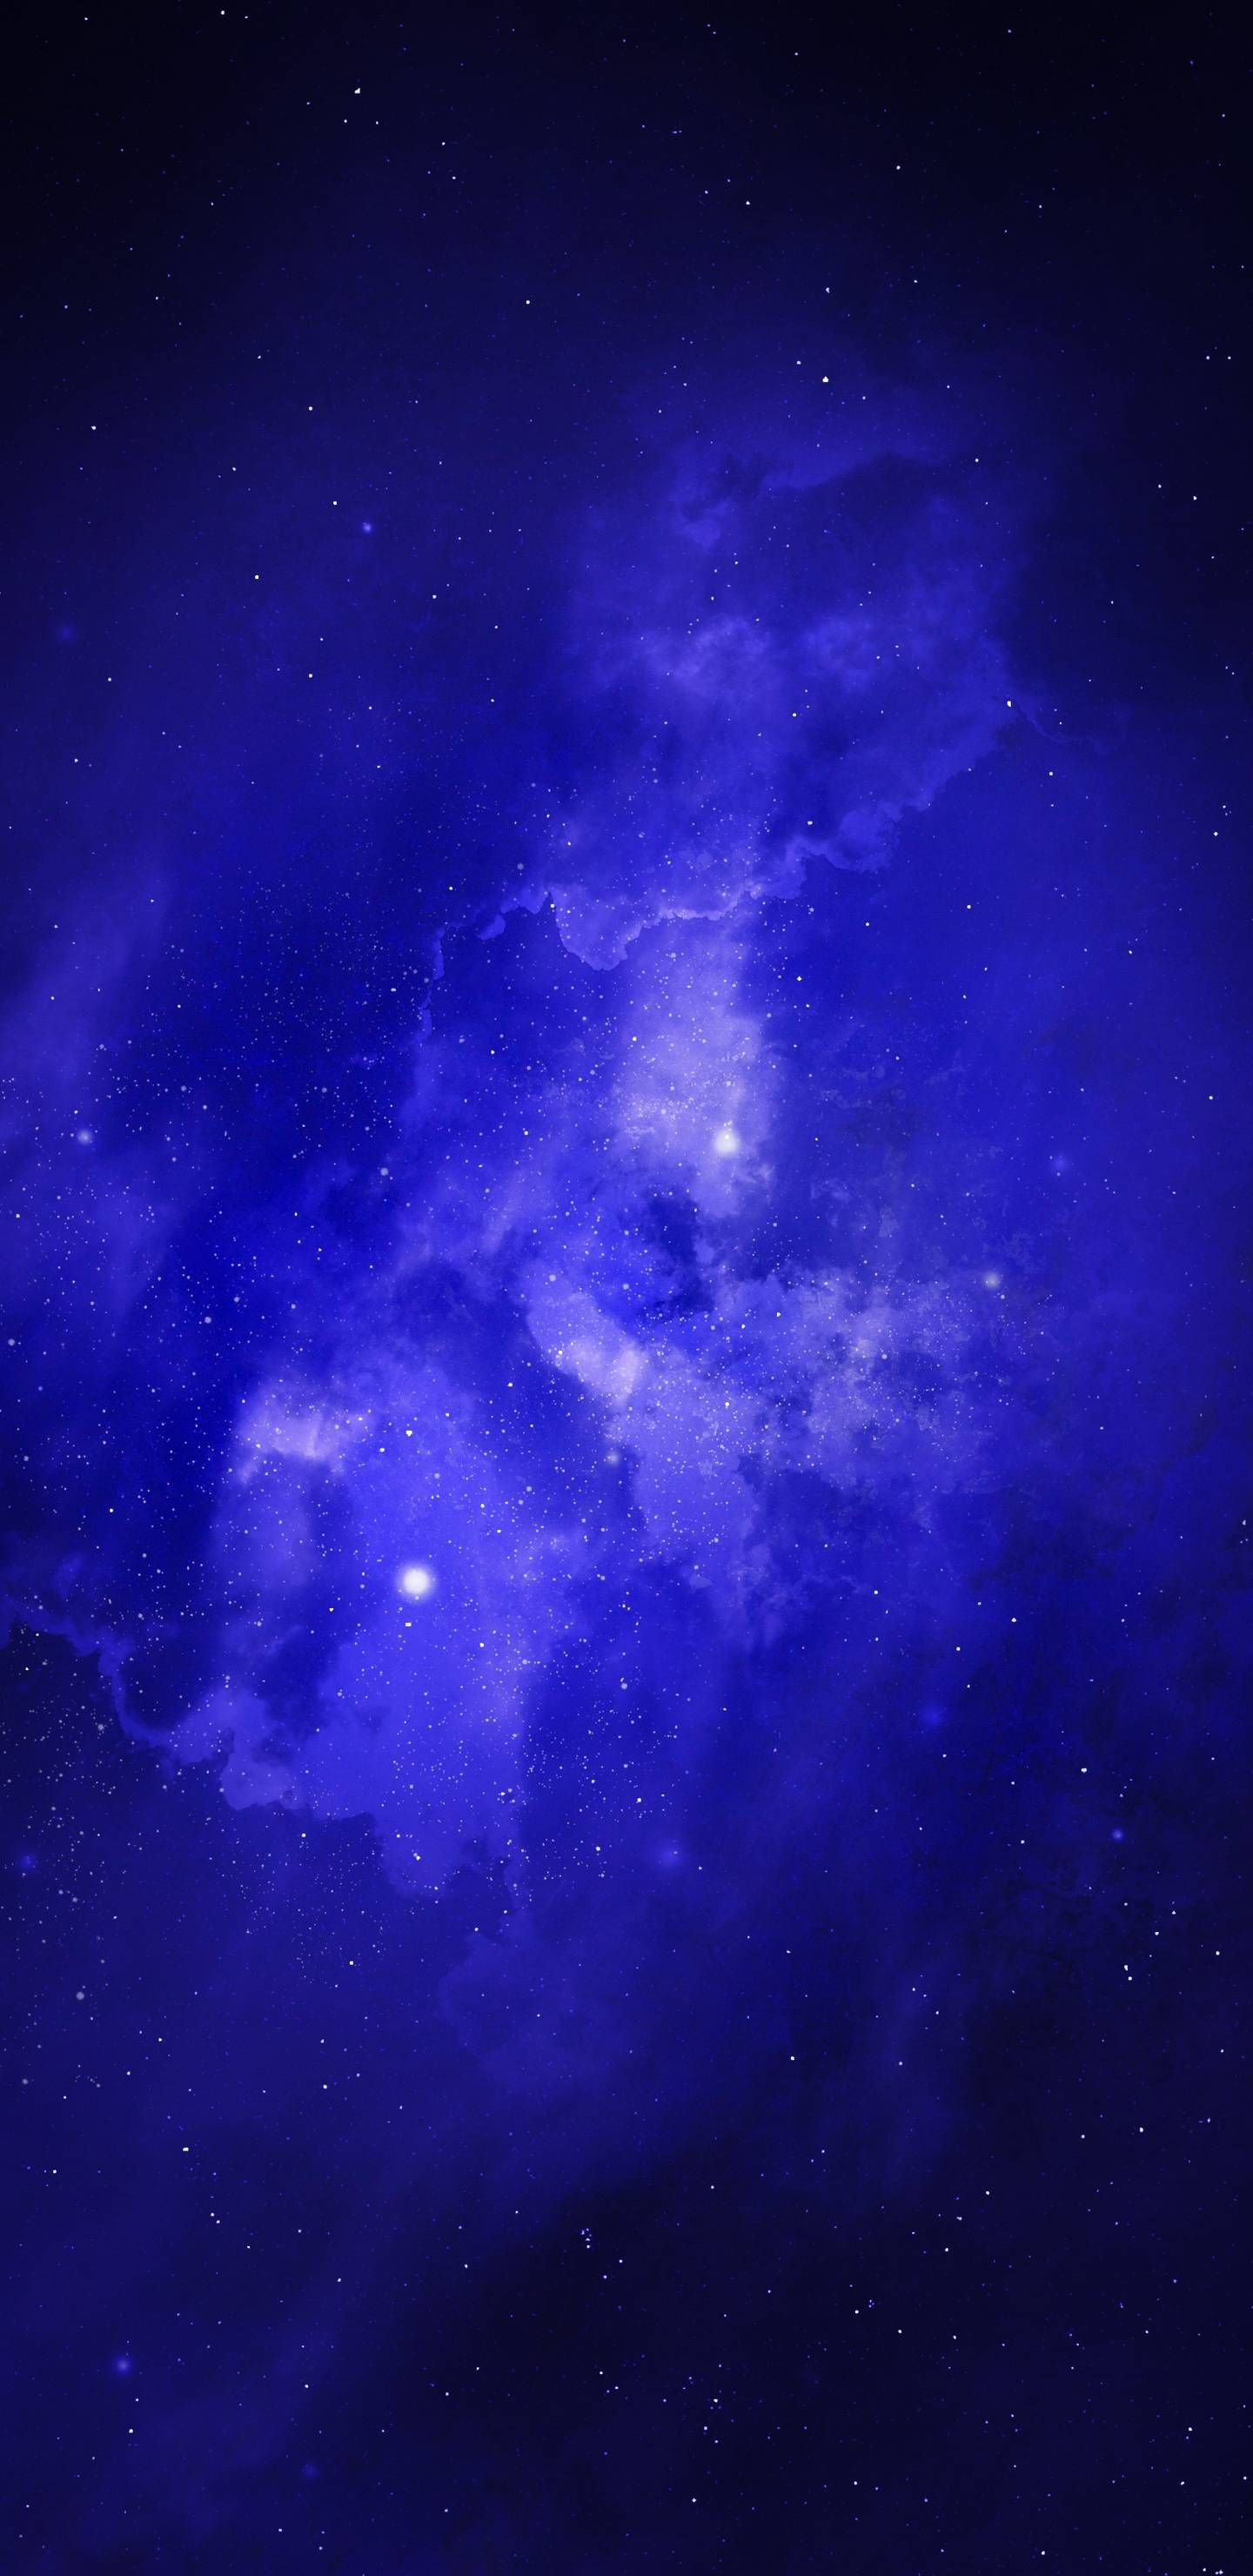 Blue Galaxy Galaxy Wallpaper Wallpaper Trendy Wall Decor